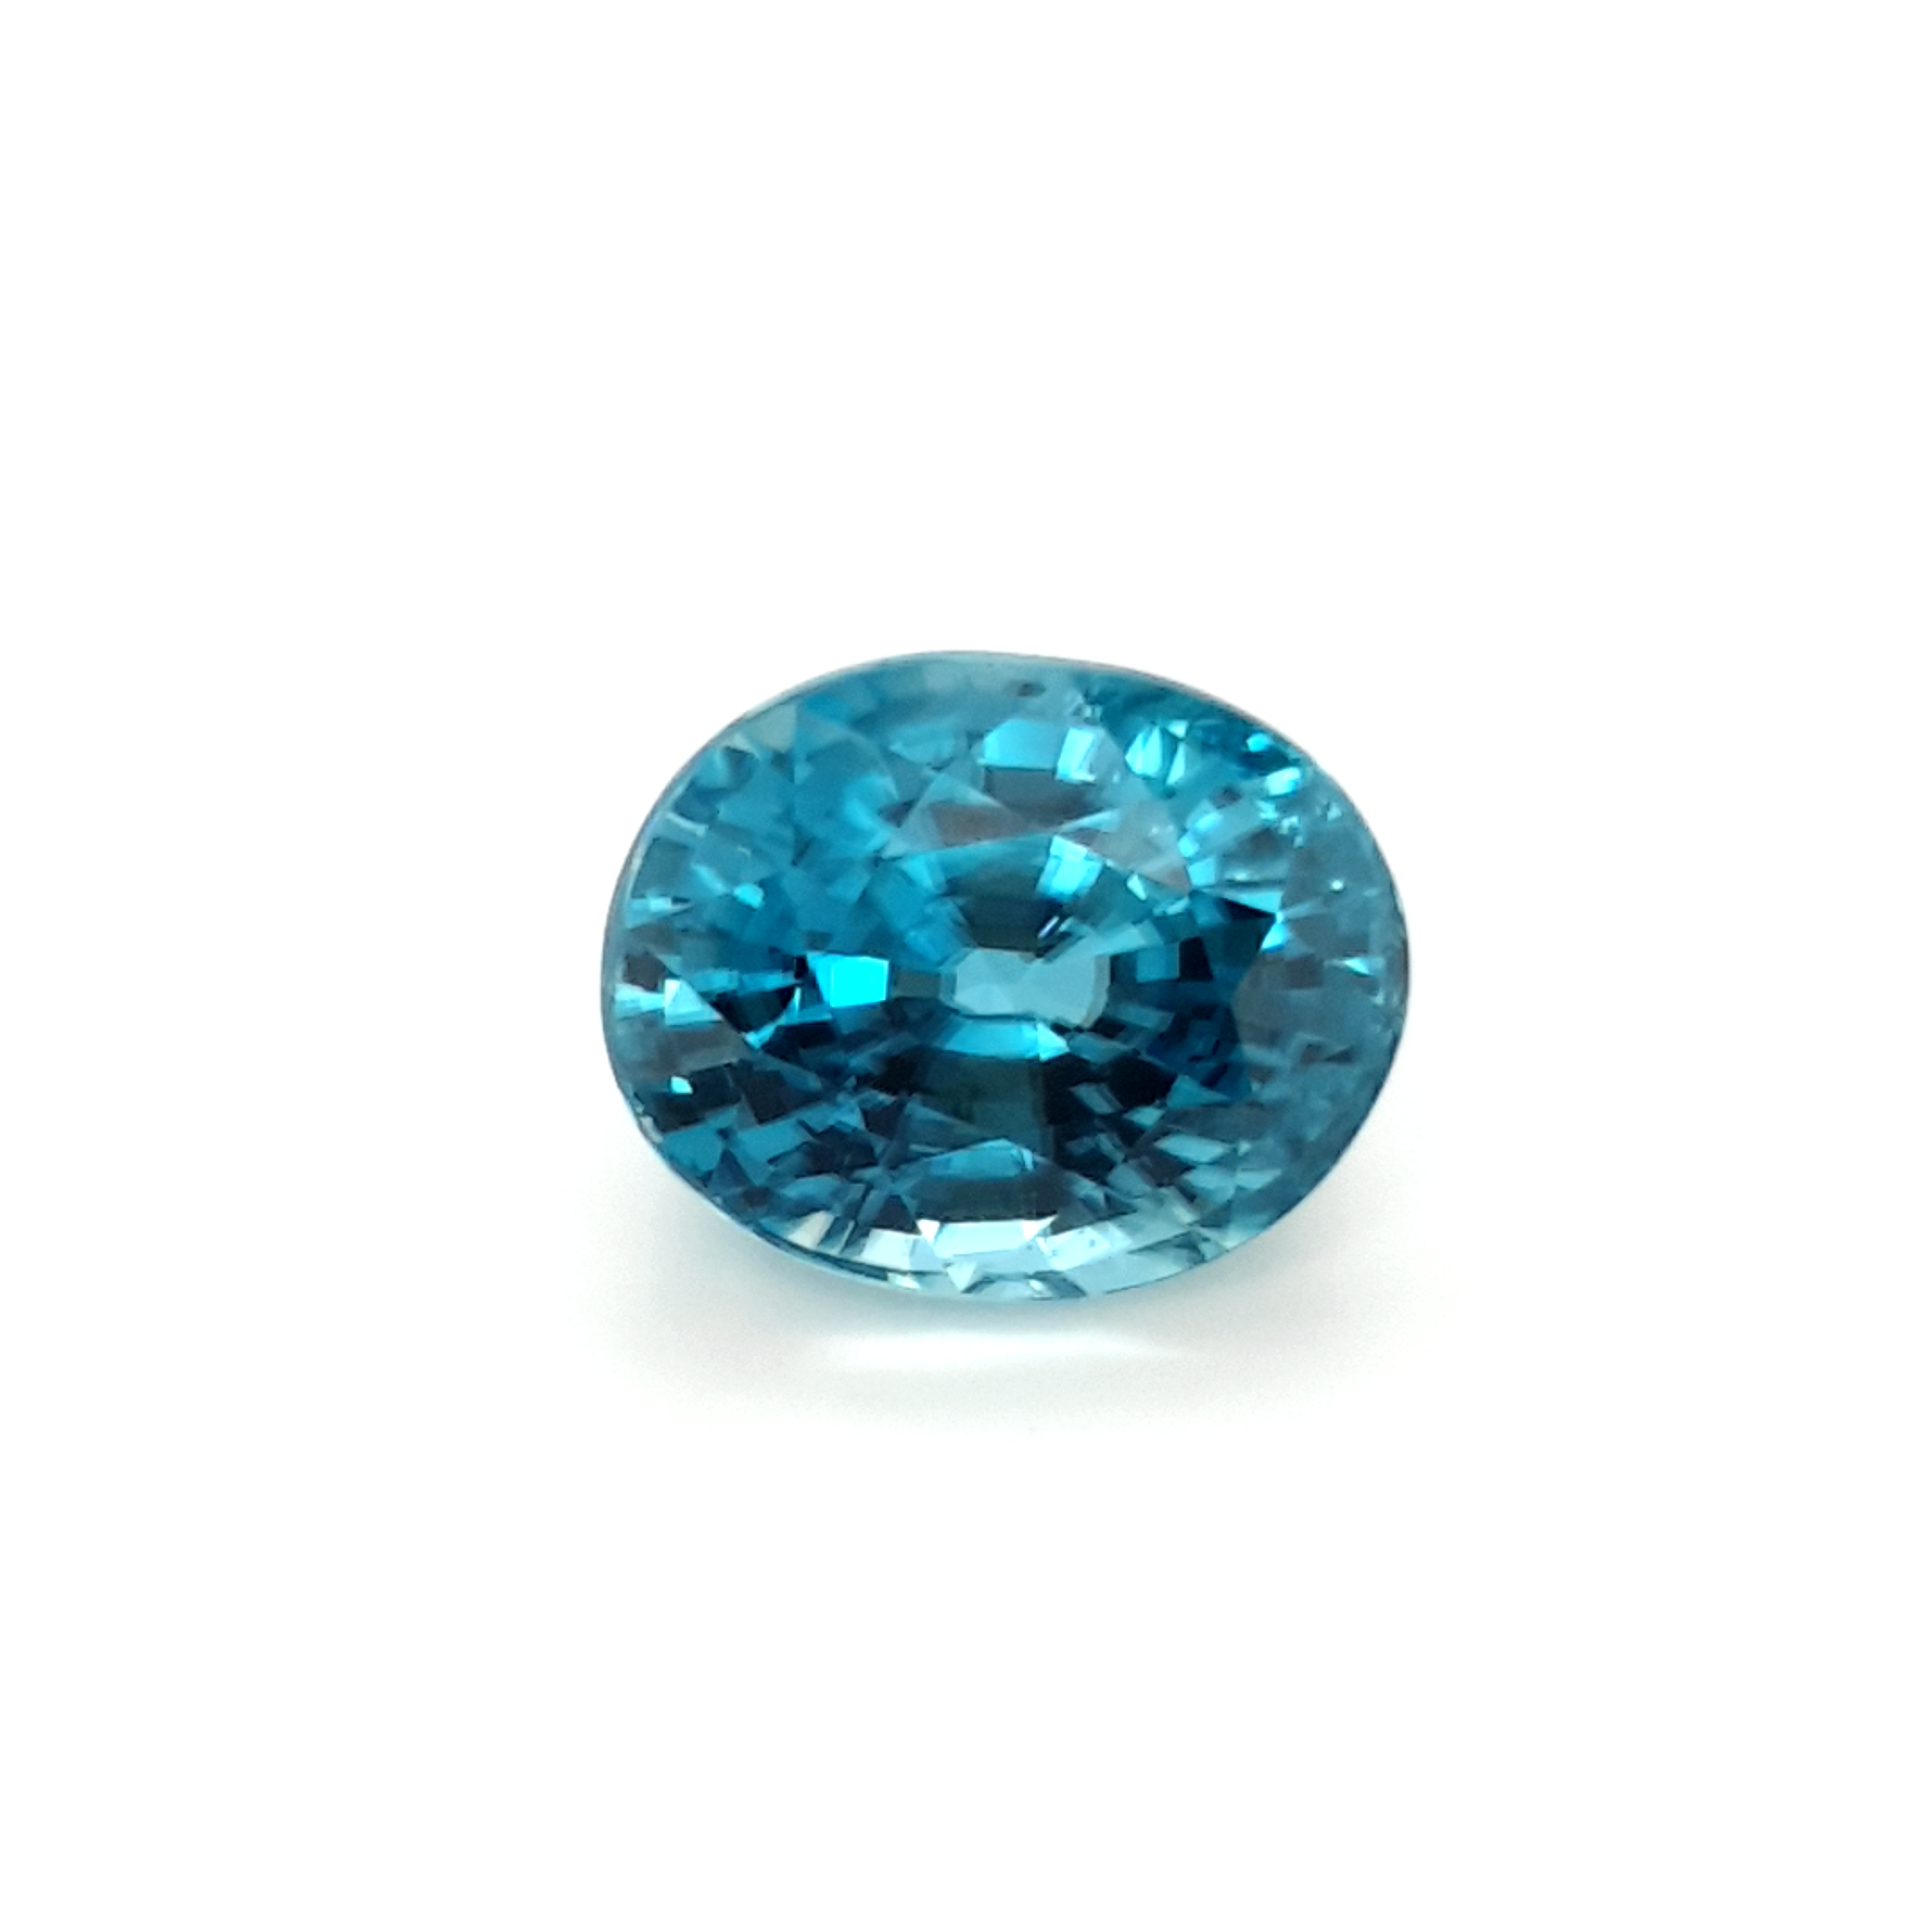 14,64ct. Starlight Blue Zircon ZCF18D3 ClaudiaHamann__2021-04-16-17-41-59